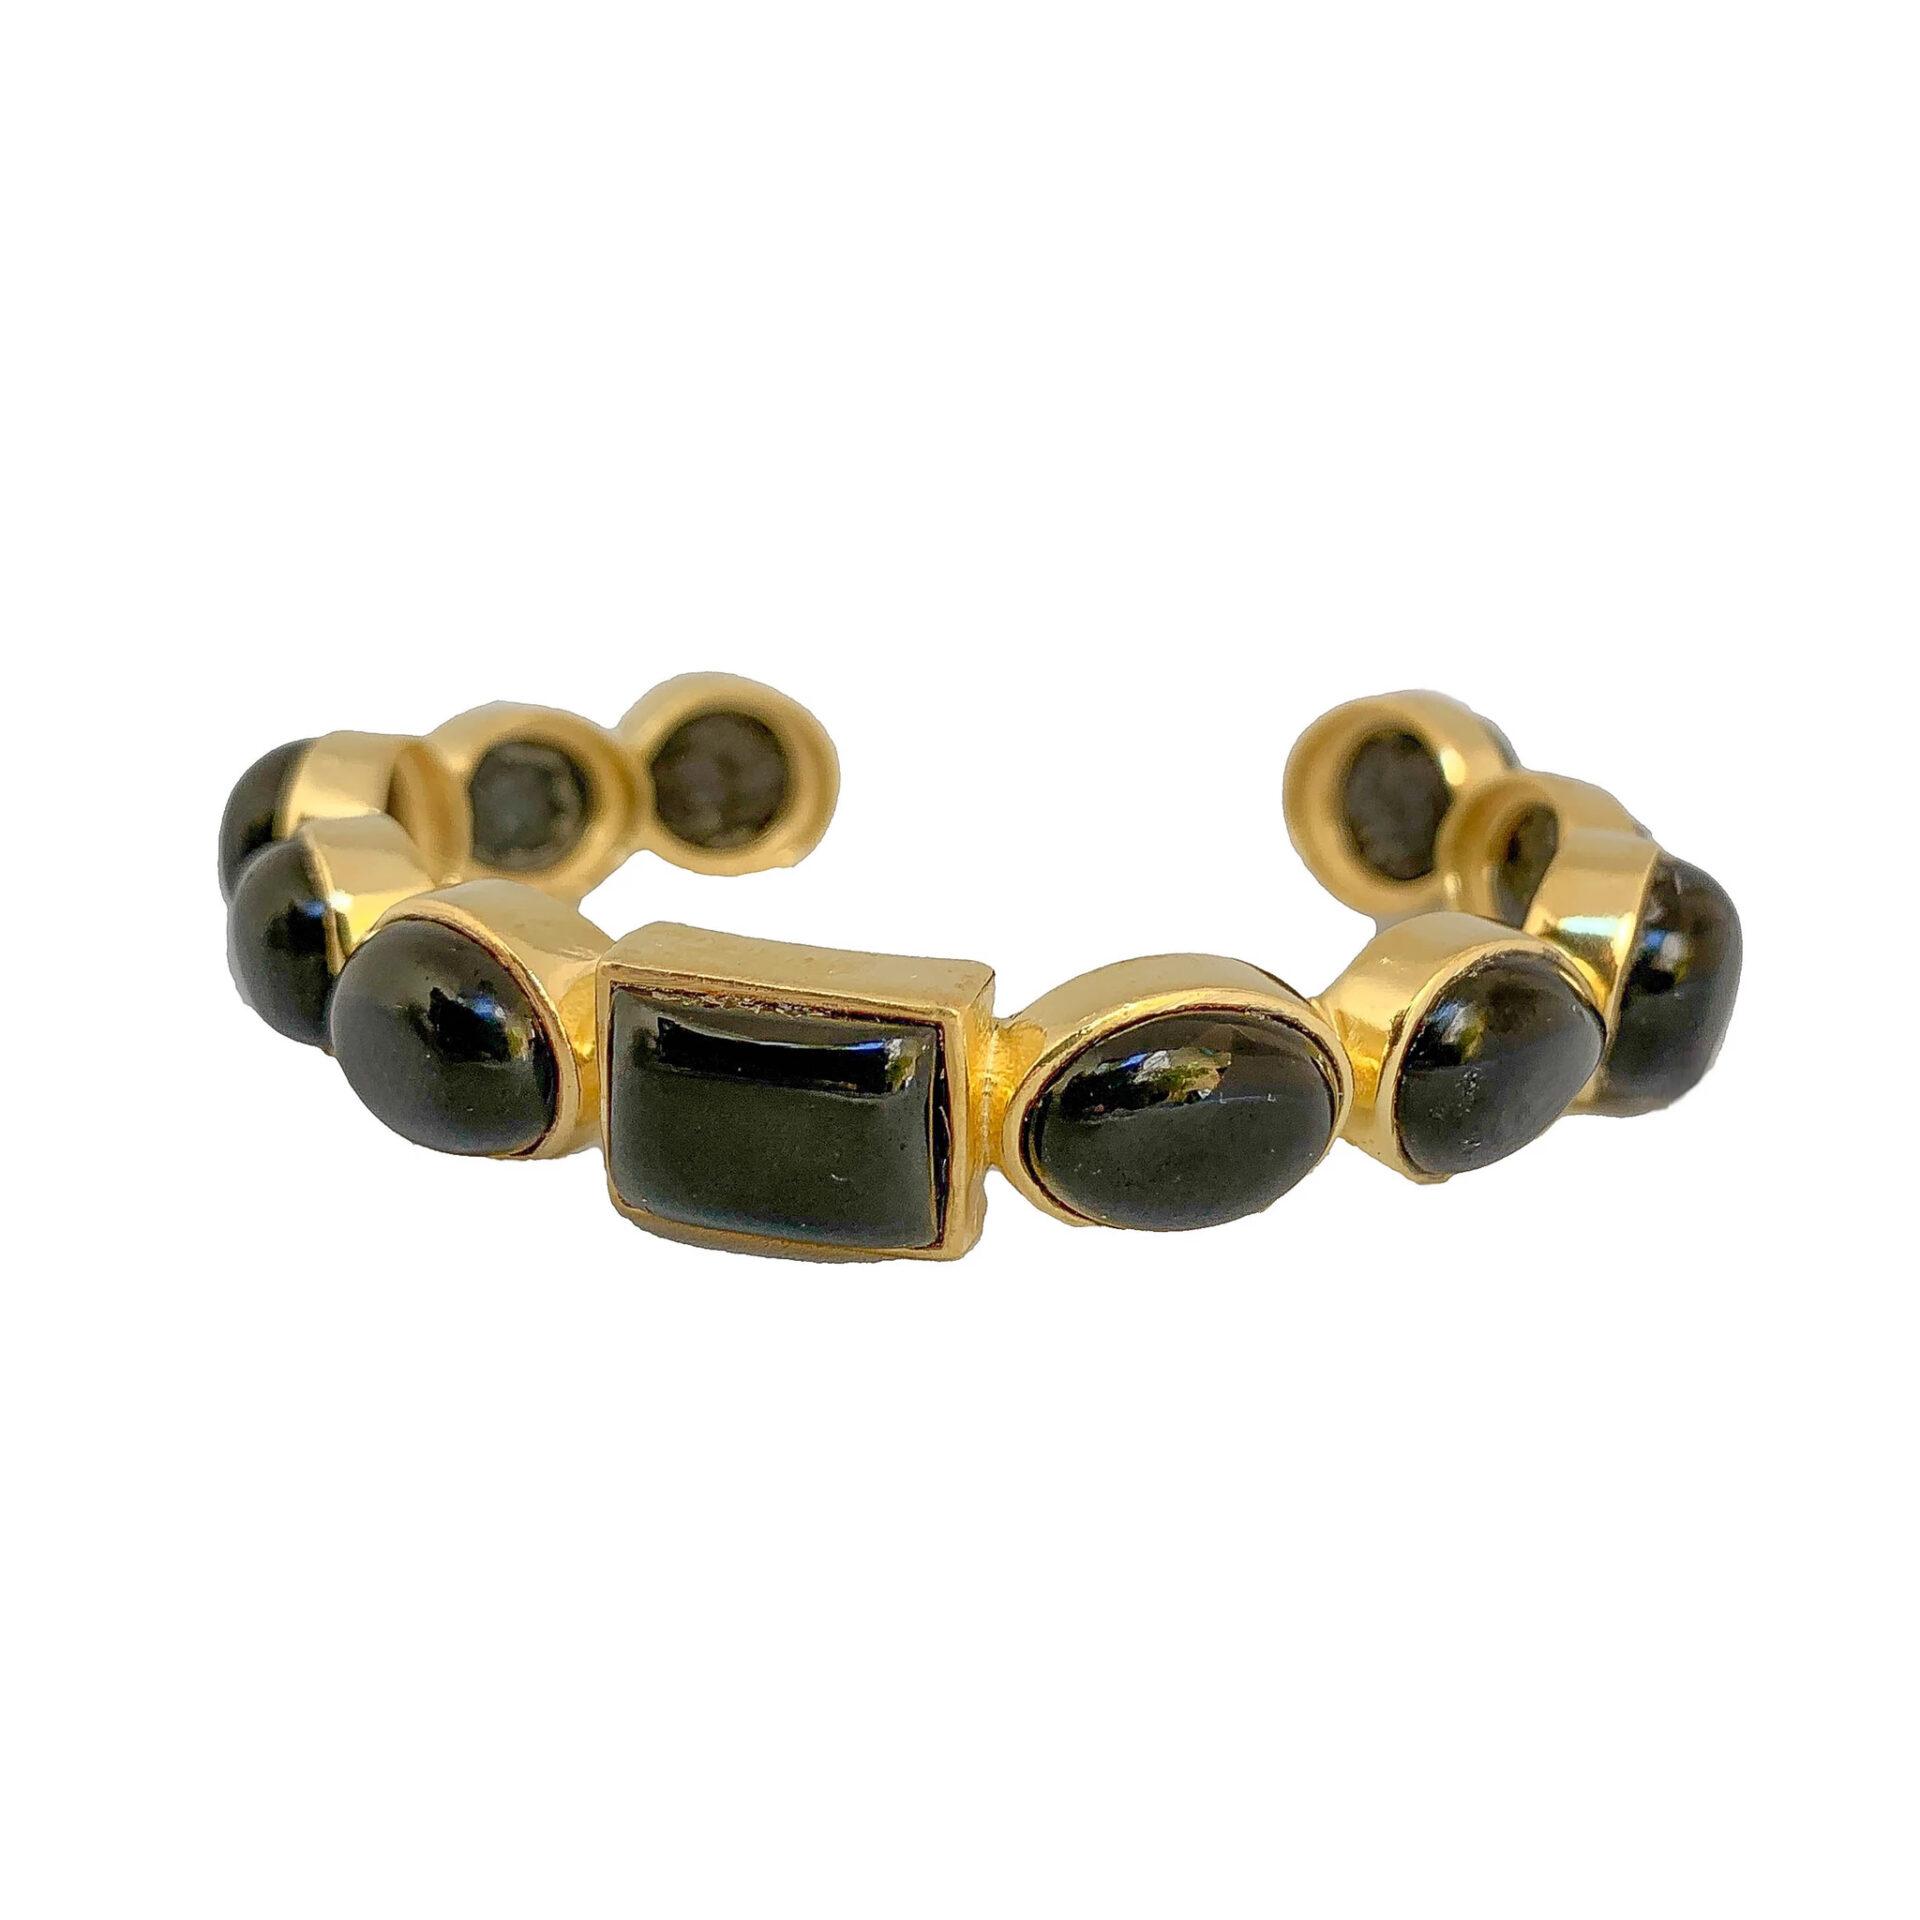 Tanya litkovska Women's Essential Bangle Bracelet